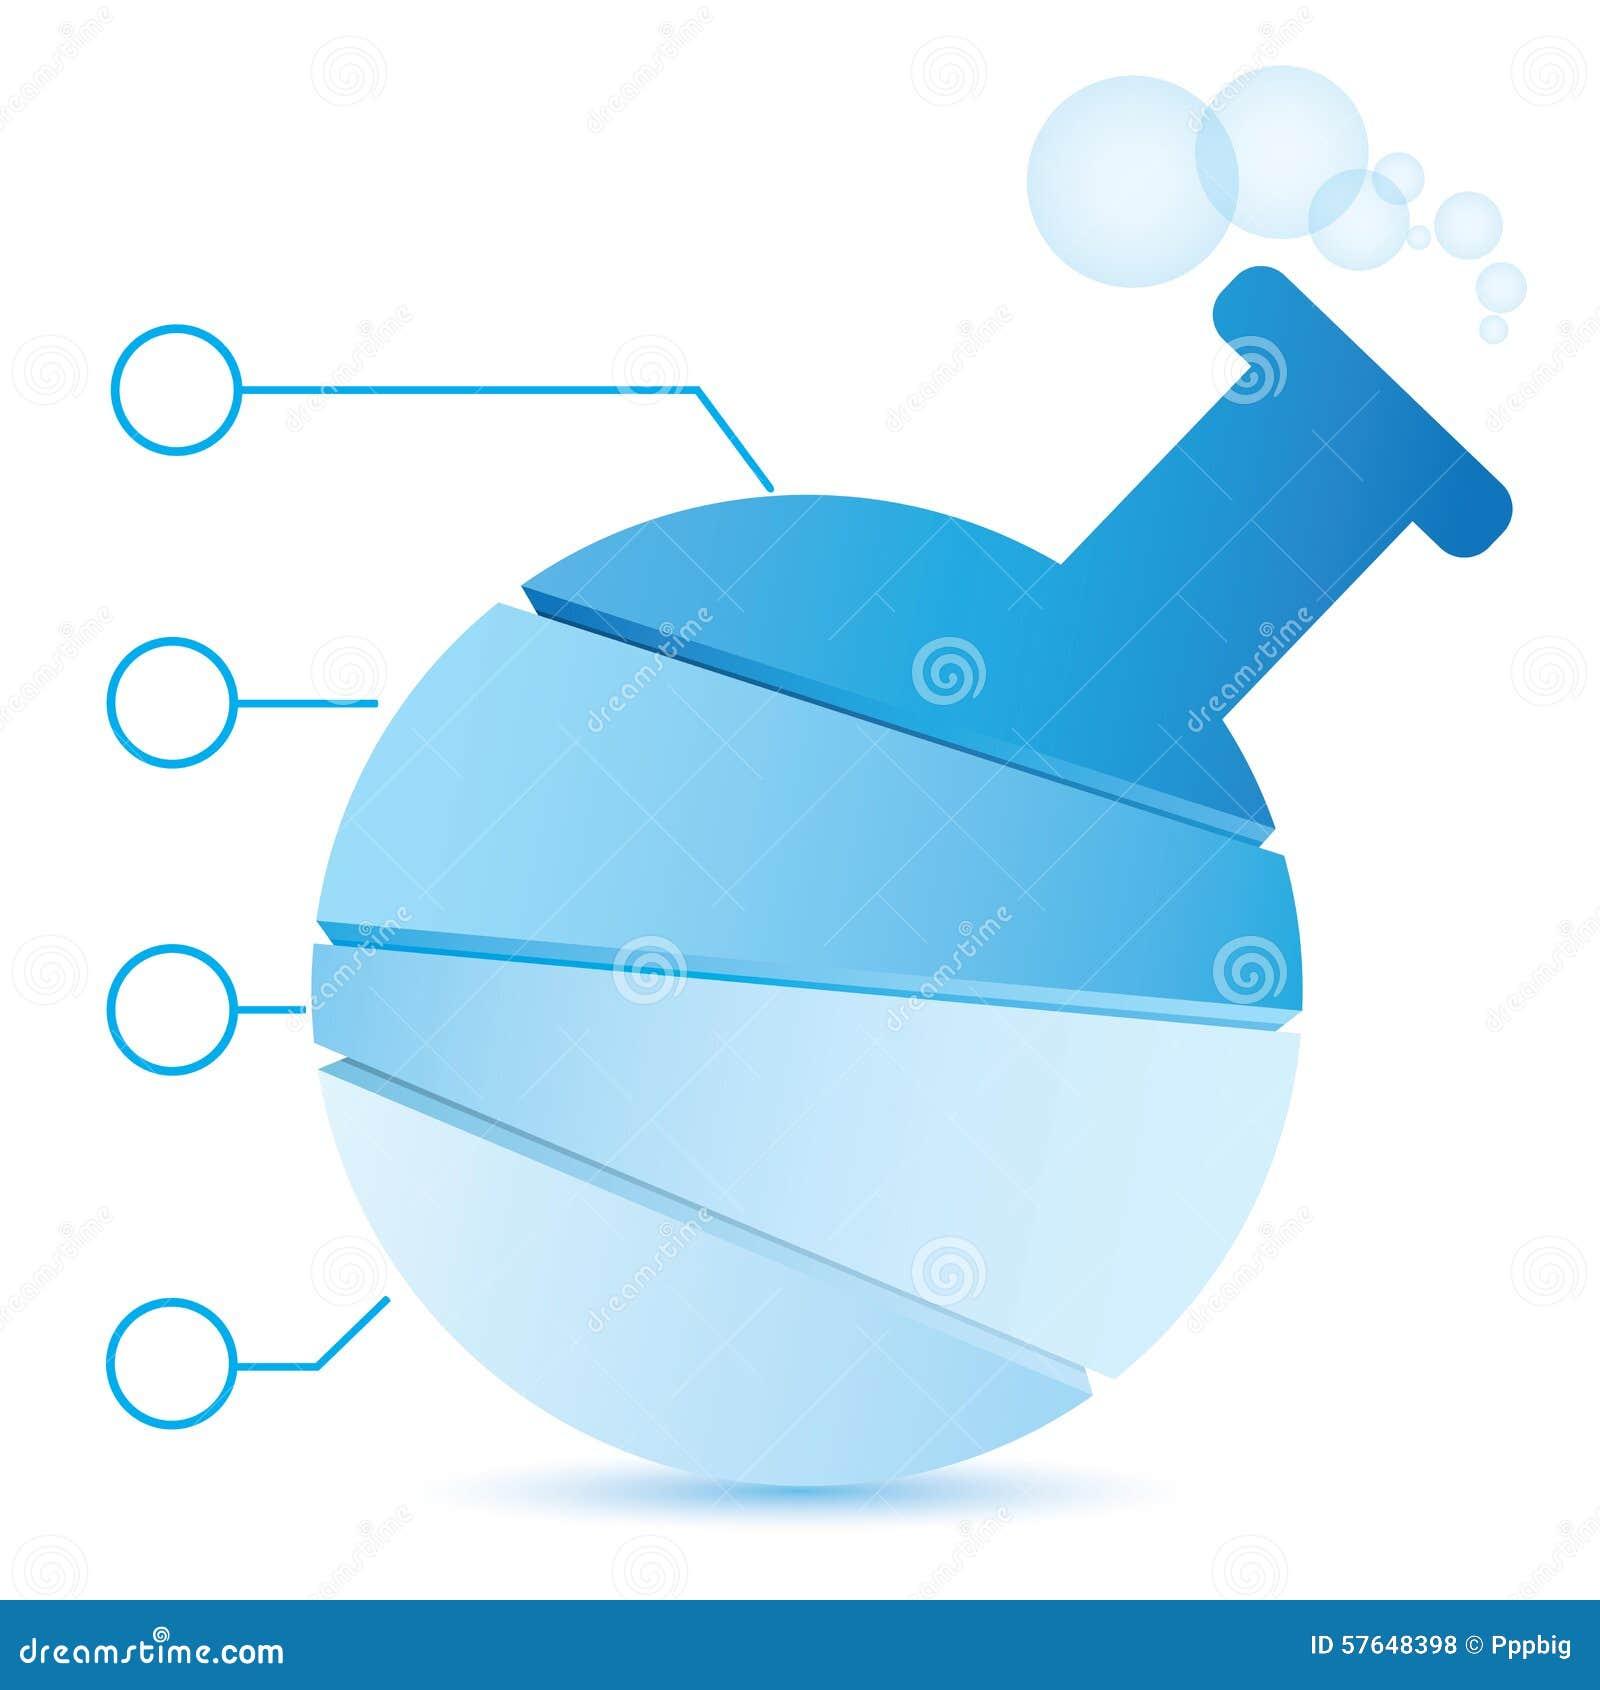 Science tube diagram stock illustration. Illustration of experiment ...